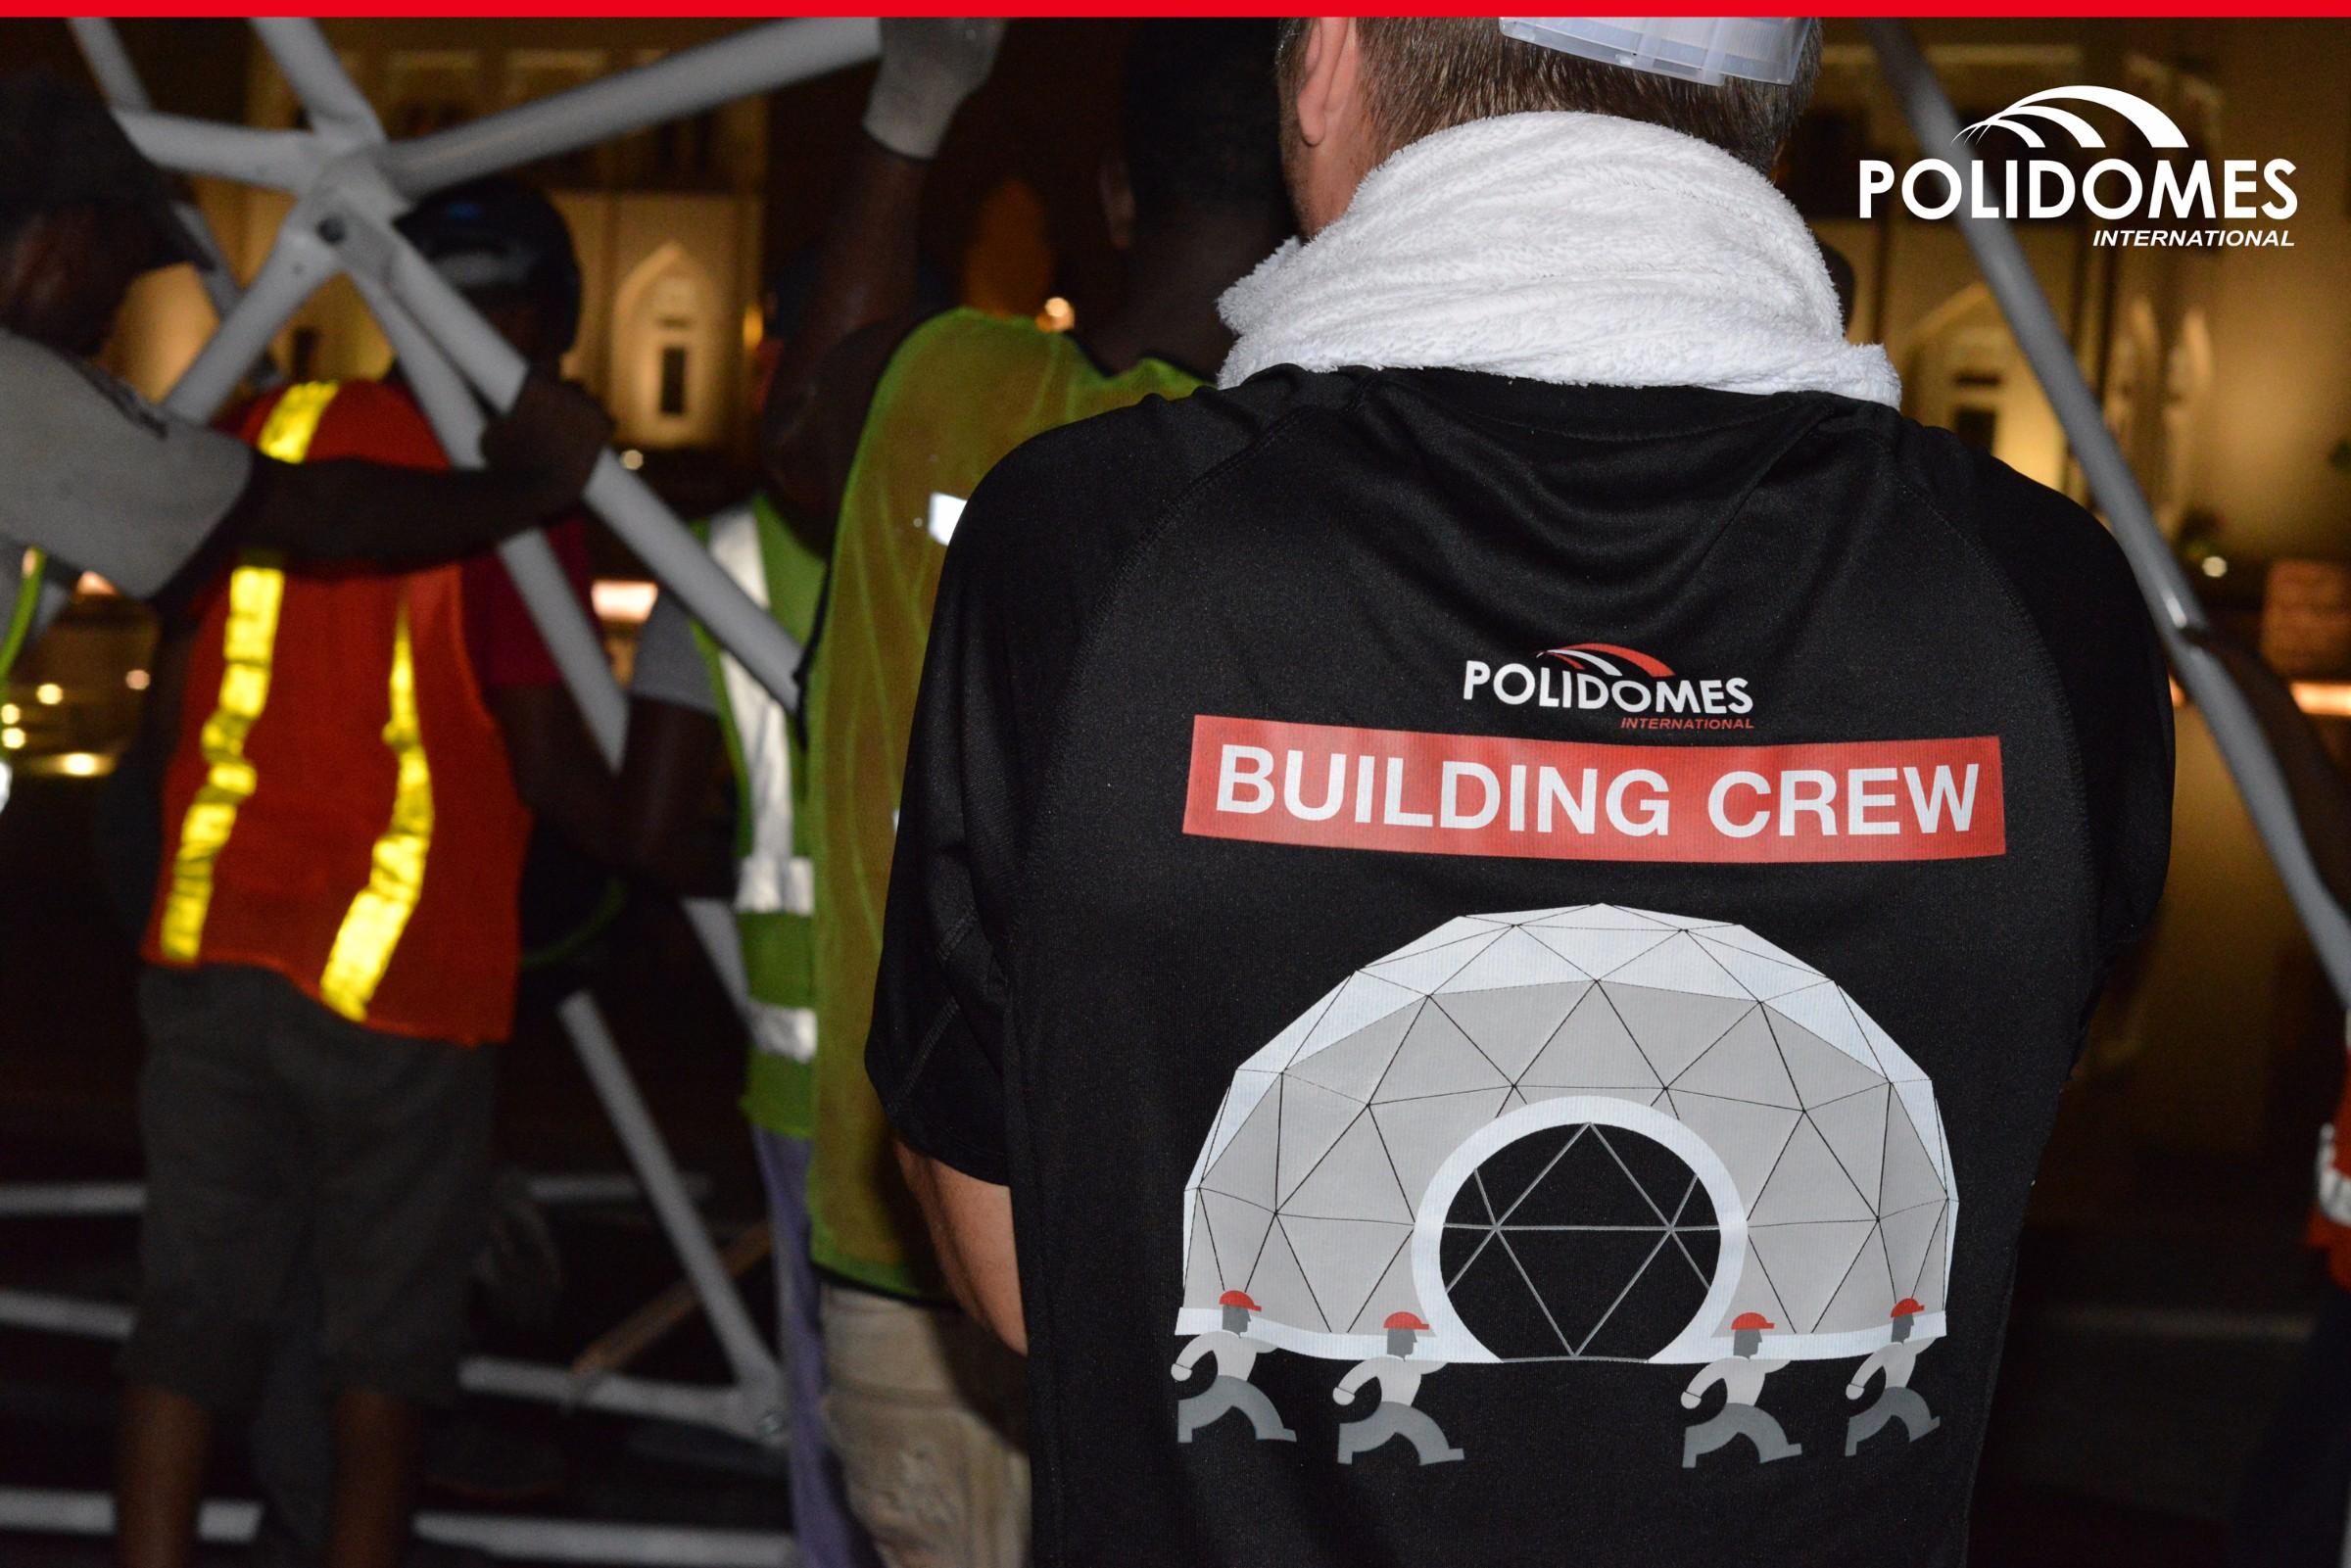 Building_crew_Polidomes